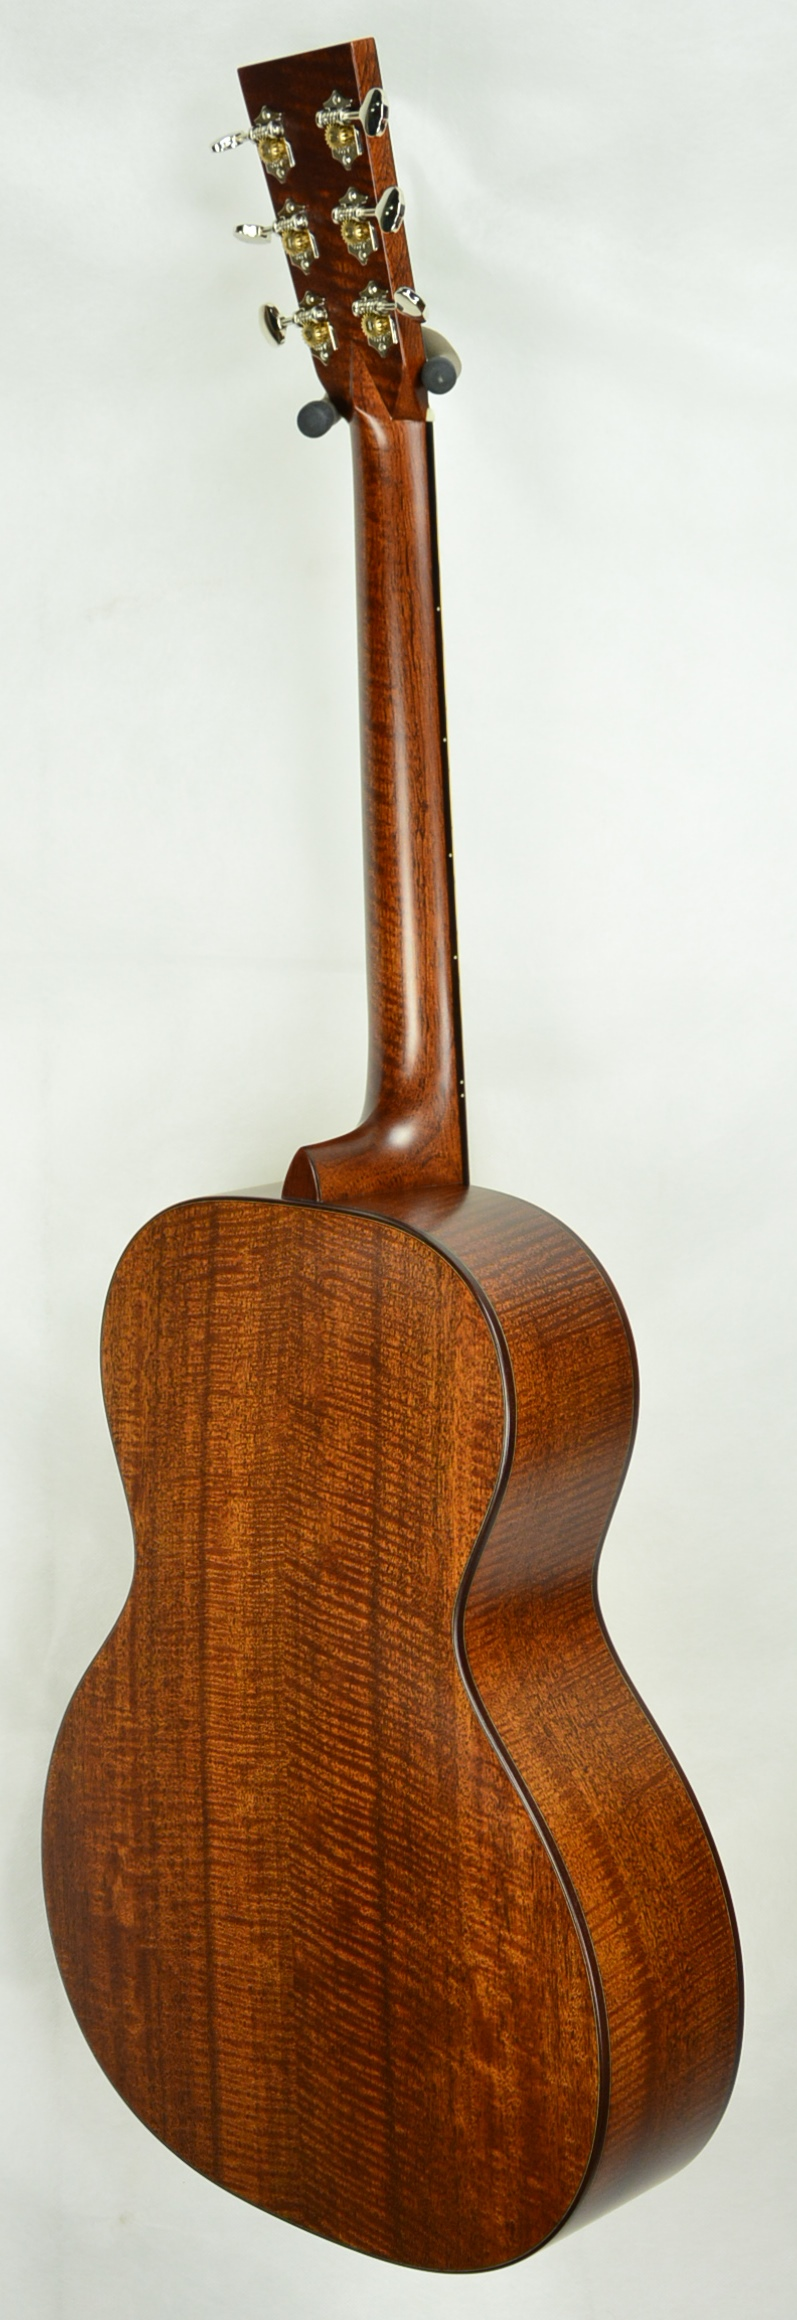 Q-2461324 S-1857313 CEO7 Fiddleback Adi  (2).JPG